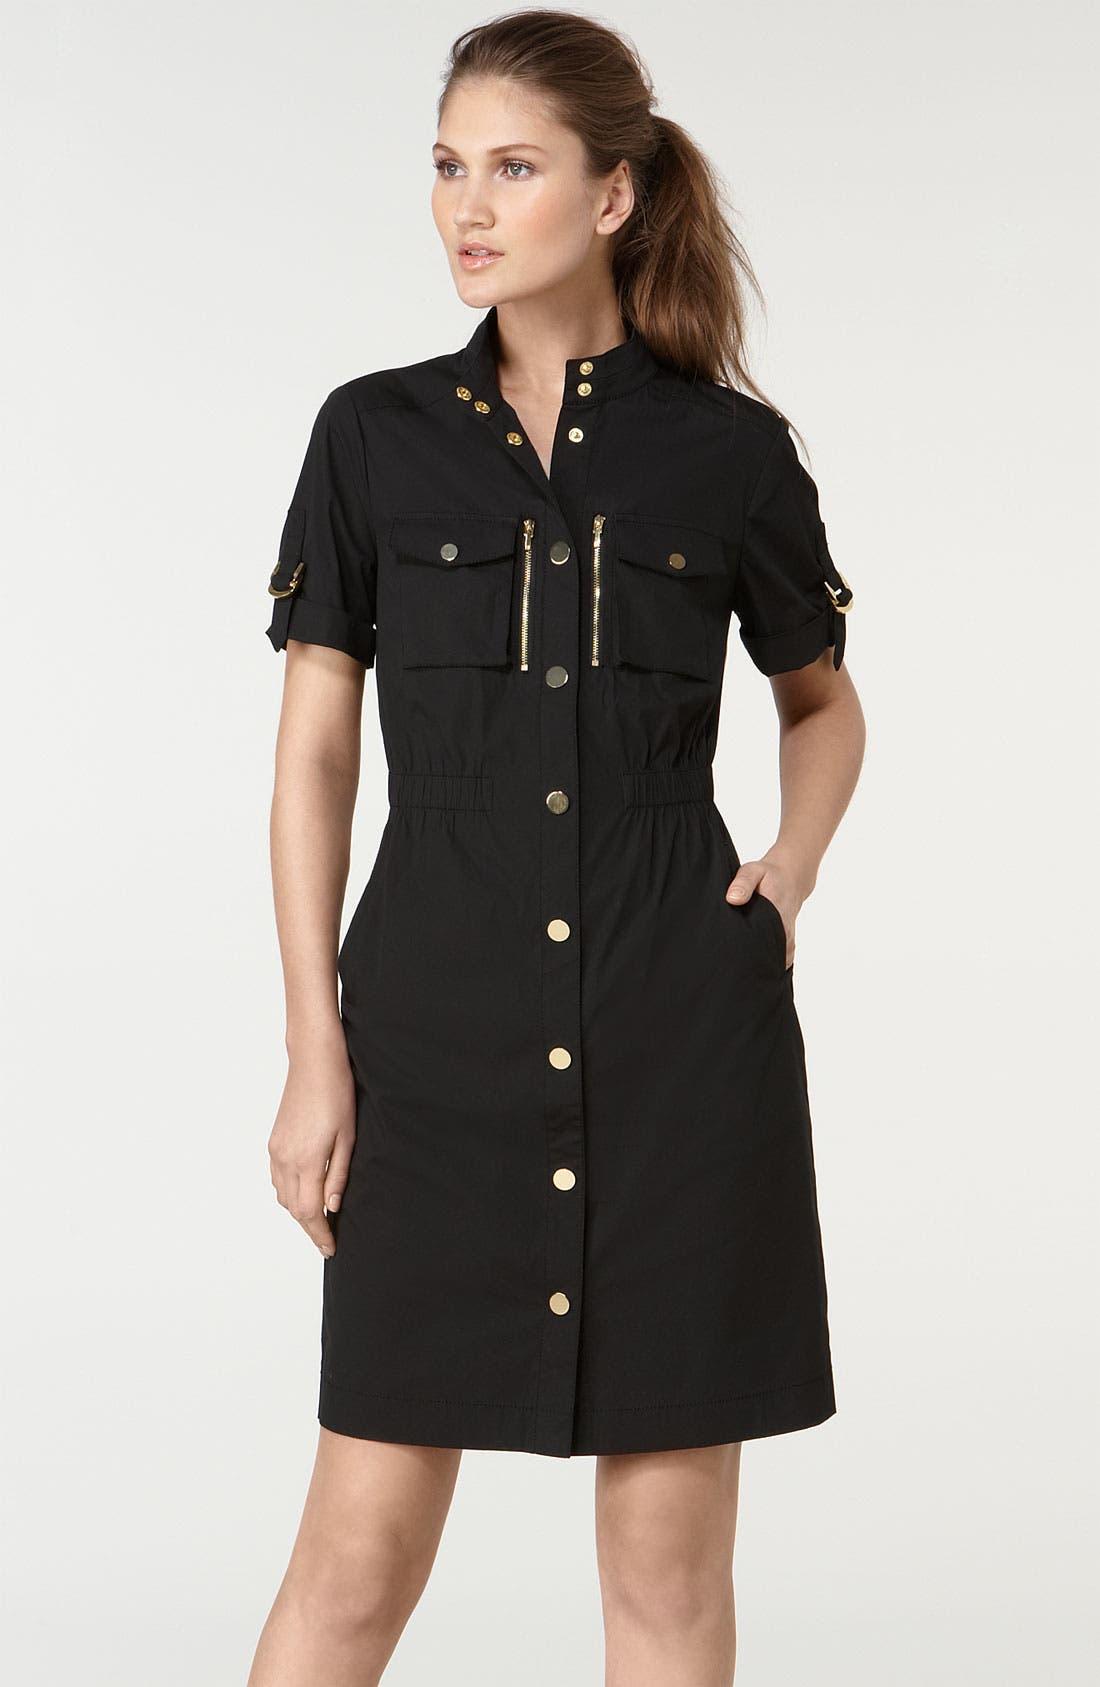 Alternate Image 1 Selected - Tory Burch 'Rebecca' Stretch Sateen Dress